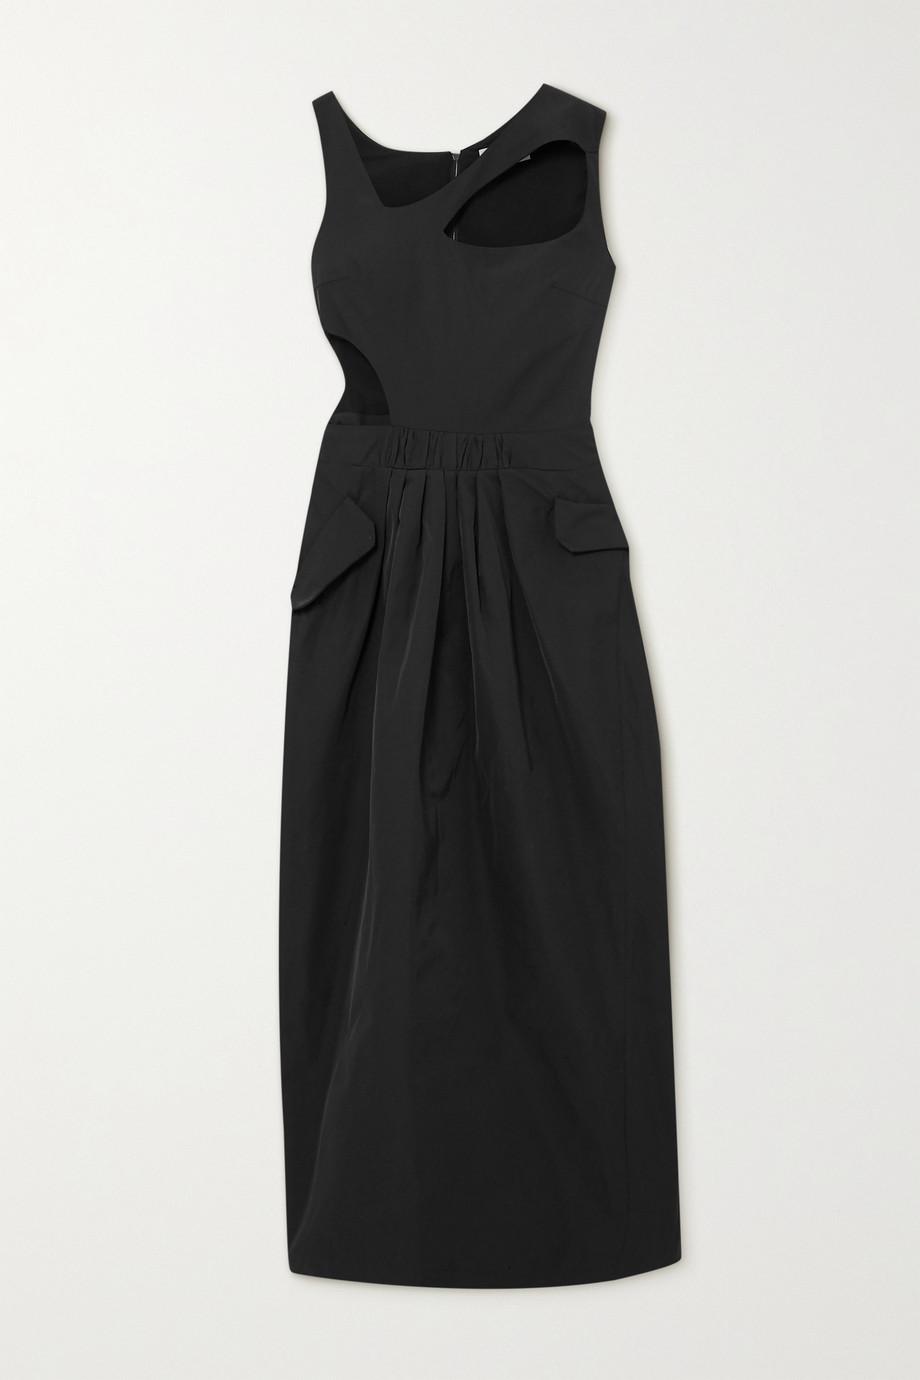 Preen by Thornton Bregazzi Norina cutout taffeta maxi dress